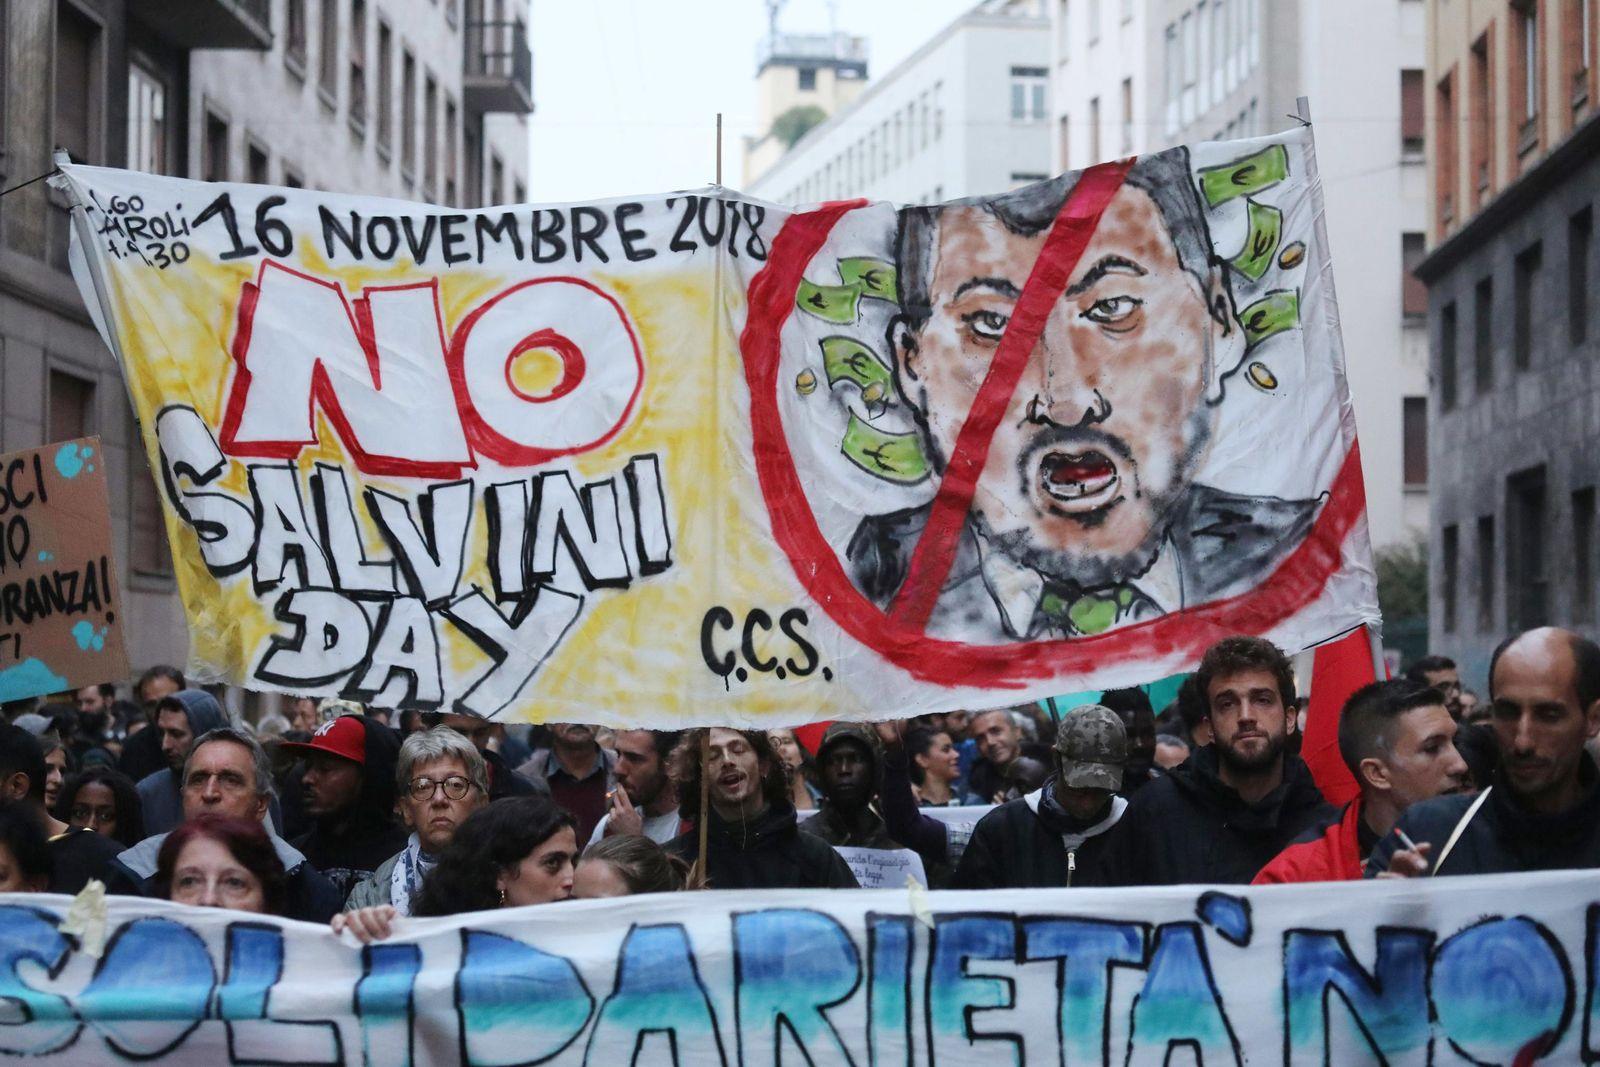 Italy Europe Migrants Salvini protest